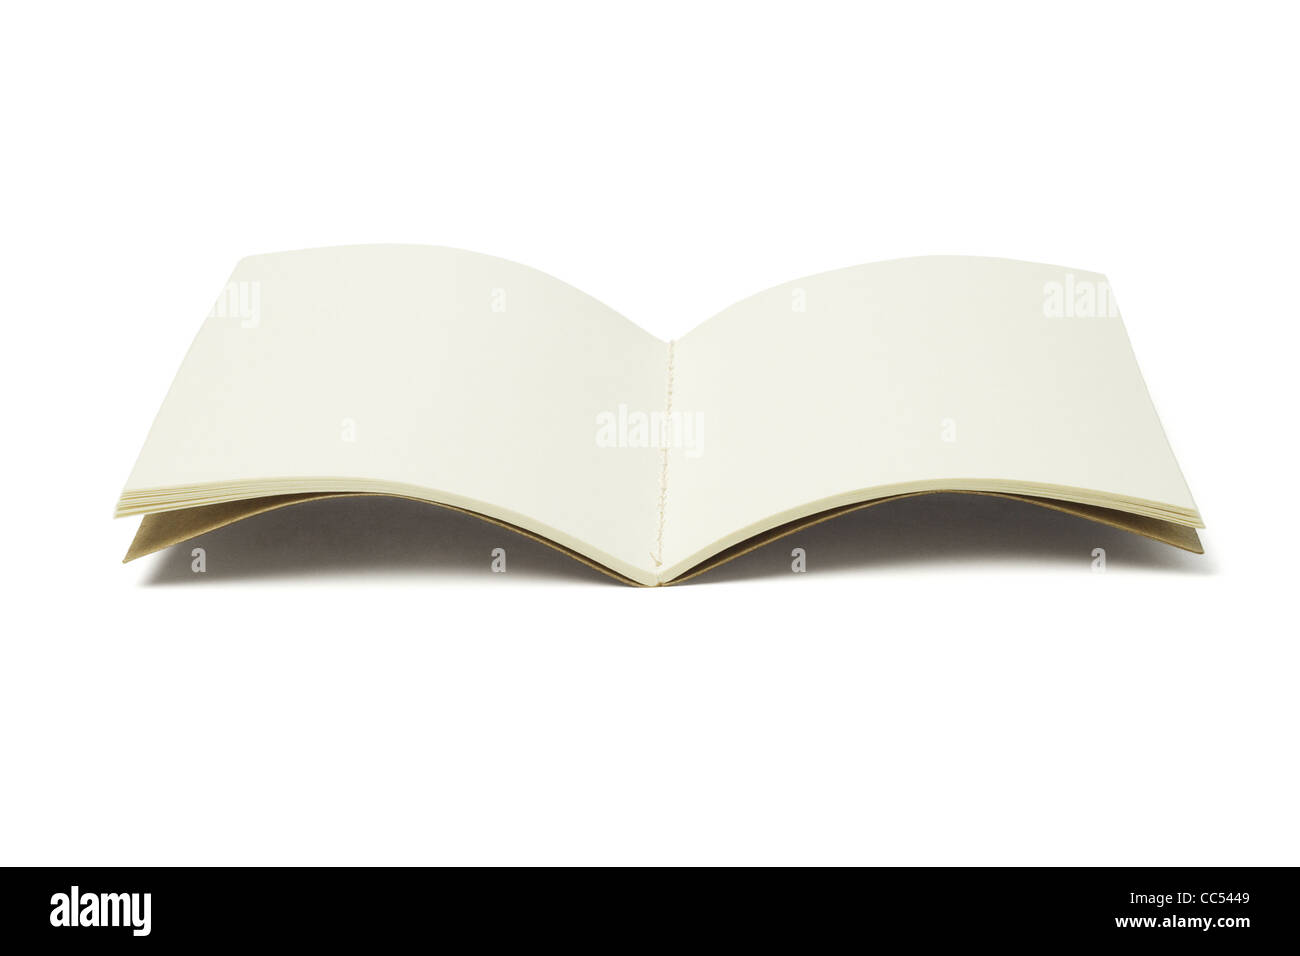 Abrir hilo coser Libro blanco sobre fondo blanco. Imagen De Stock